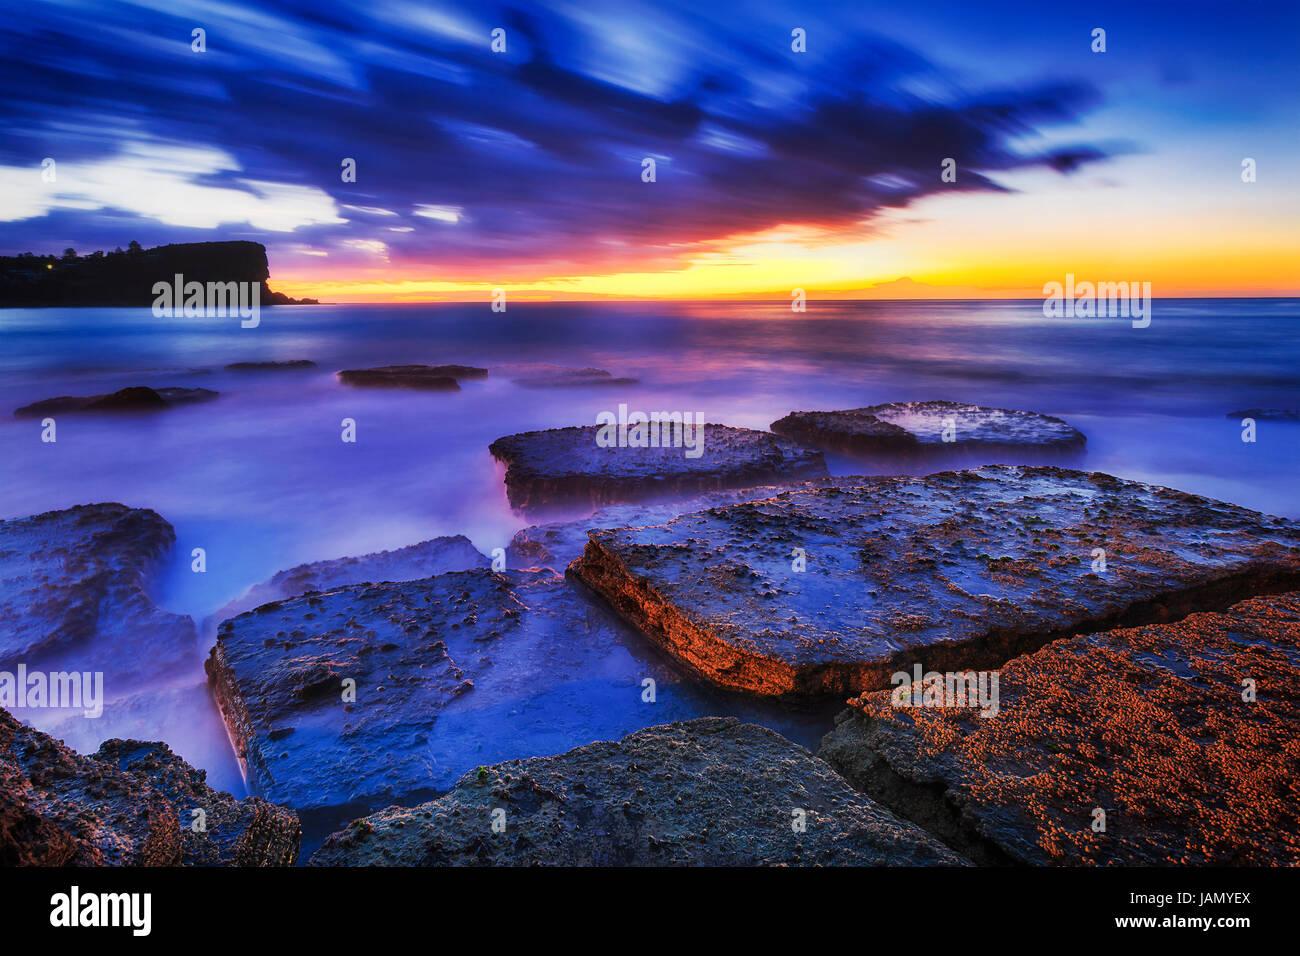 Dark blue hour sunrise over sea horizon at Avalon beach rocks with alga of Sydney Northern beaches. - Stock Image